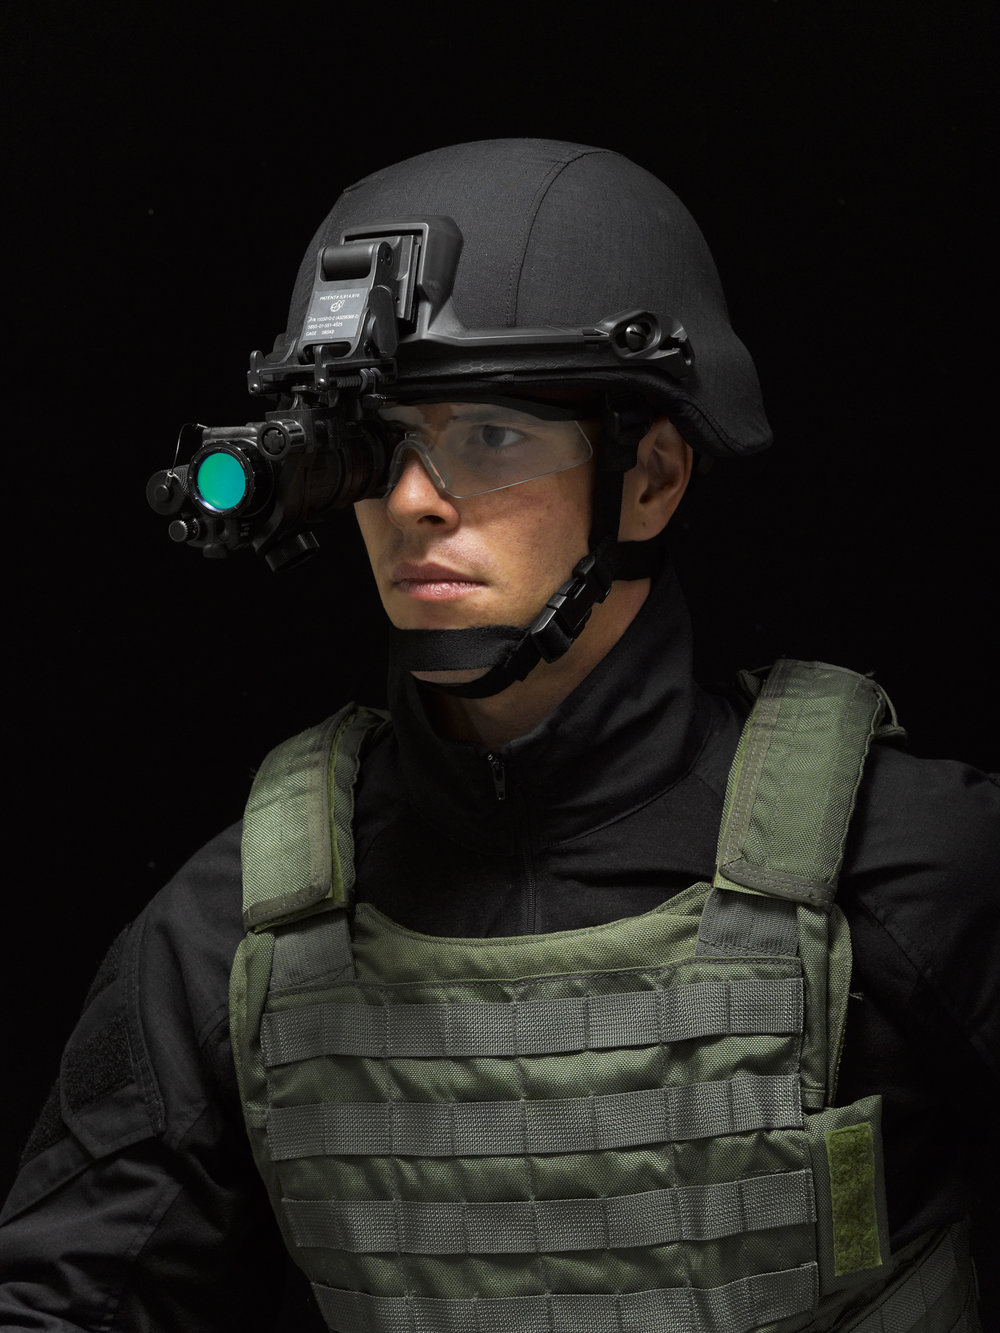 SWAT_NVG_Angle.jpg